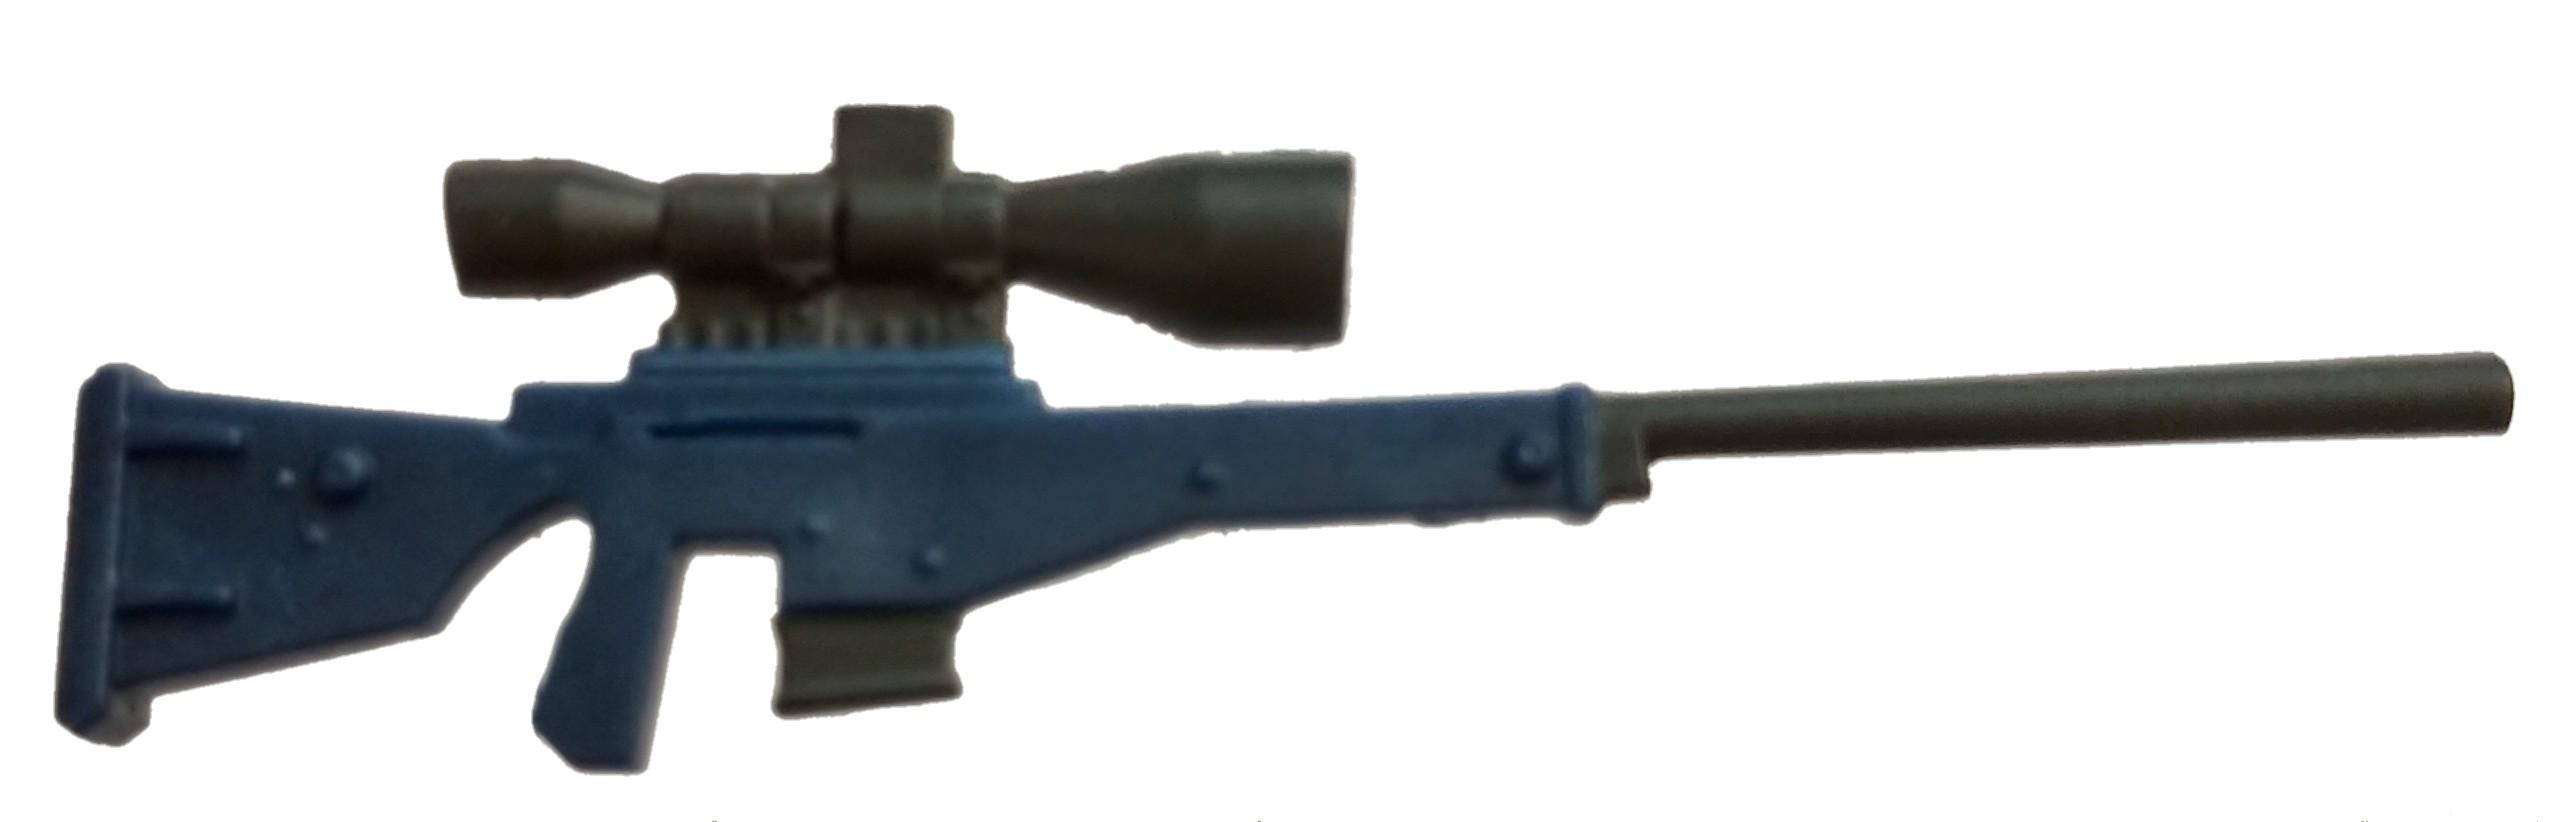 Fortnite Bolt Action Sniper Rifle 2 Inch Rare Figure Accessory Blue Loose Ebay